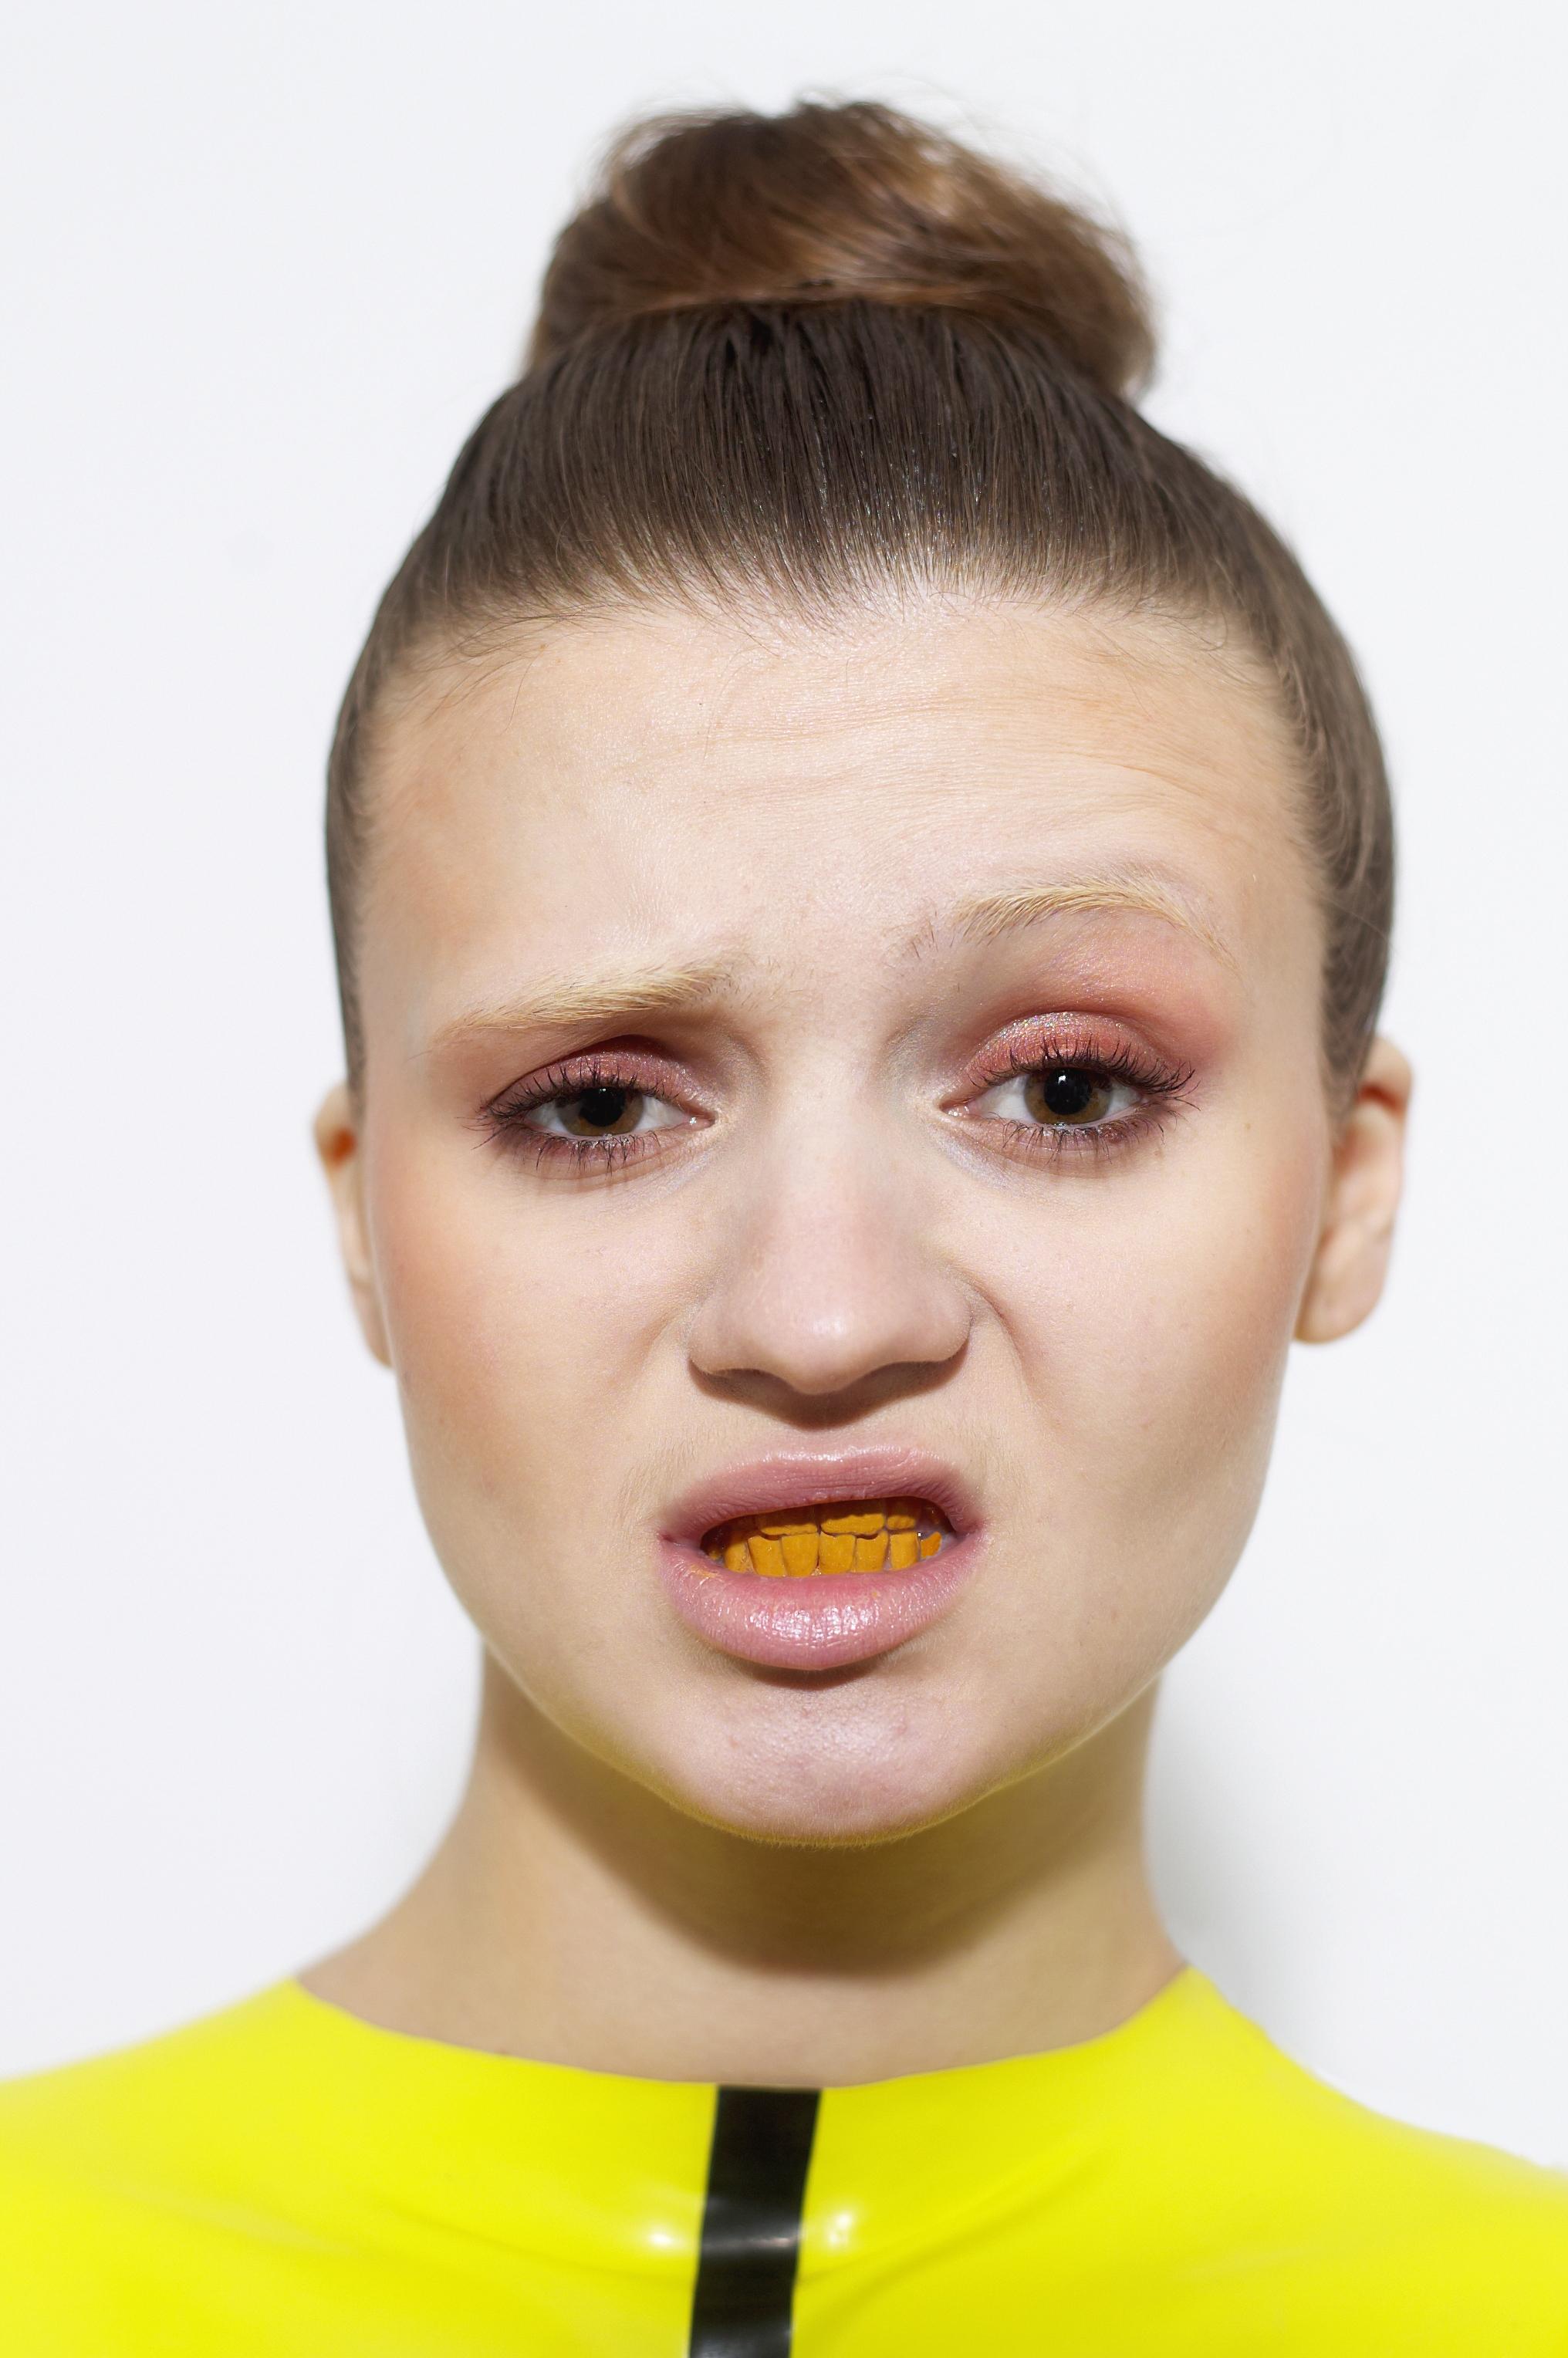 yellow teeth close-up 2 copy.jpg